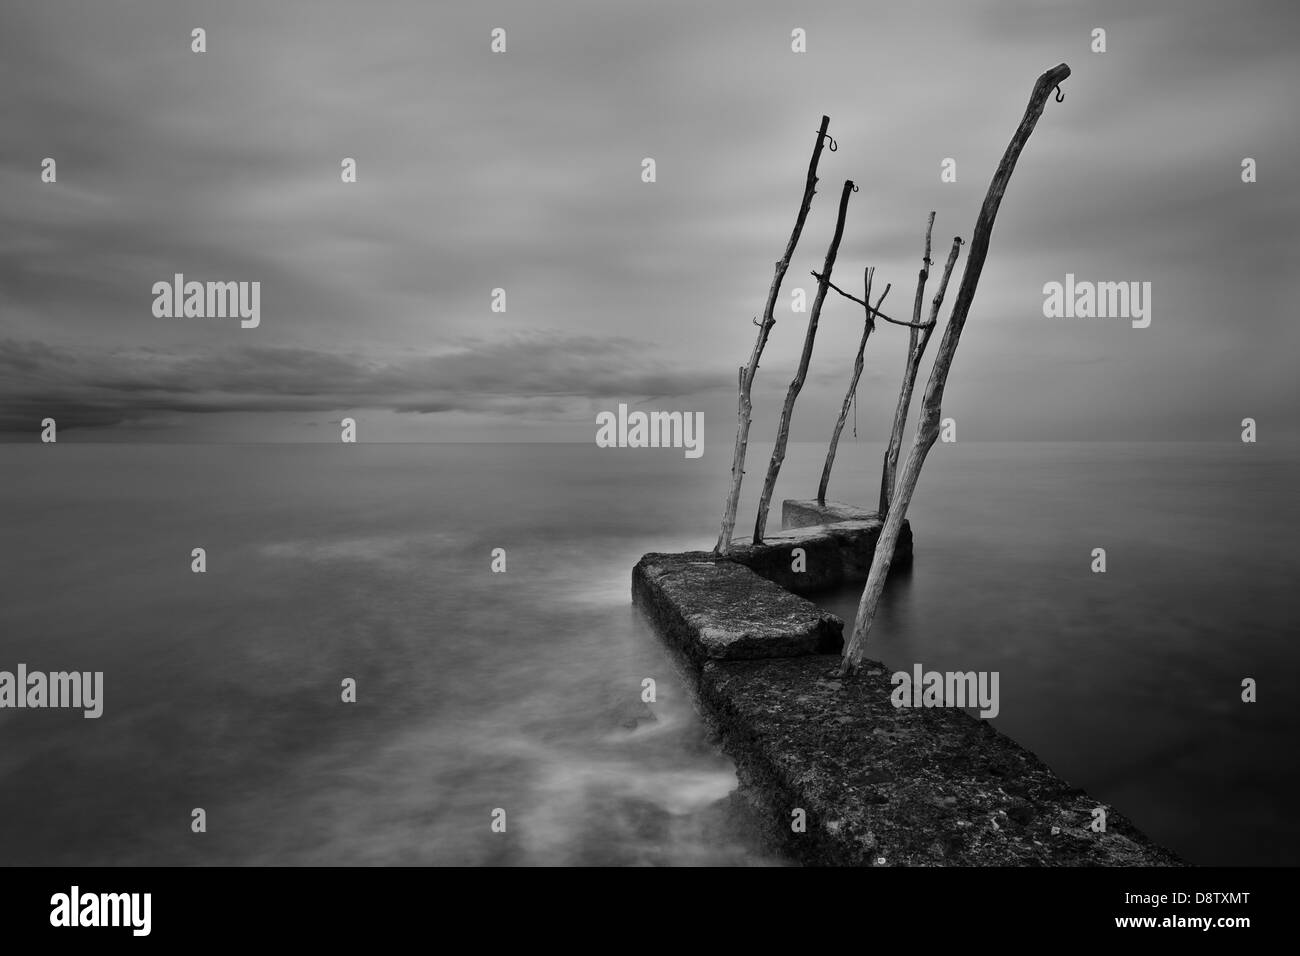 South wind approaching pier, Basania, Istria, Croatia - Stock Image